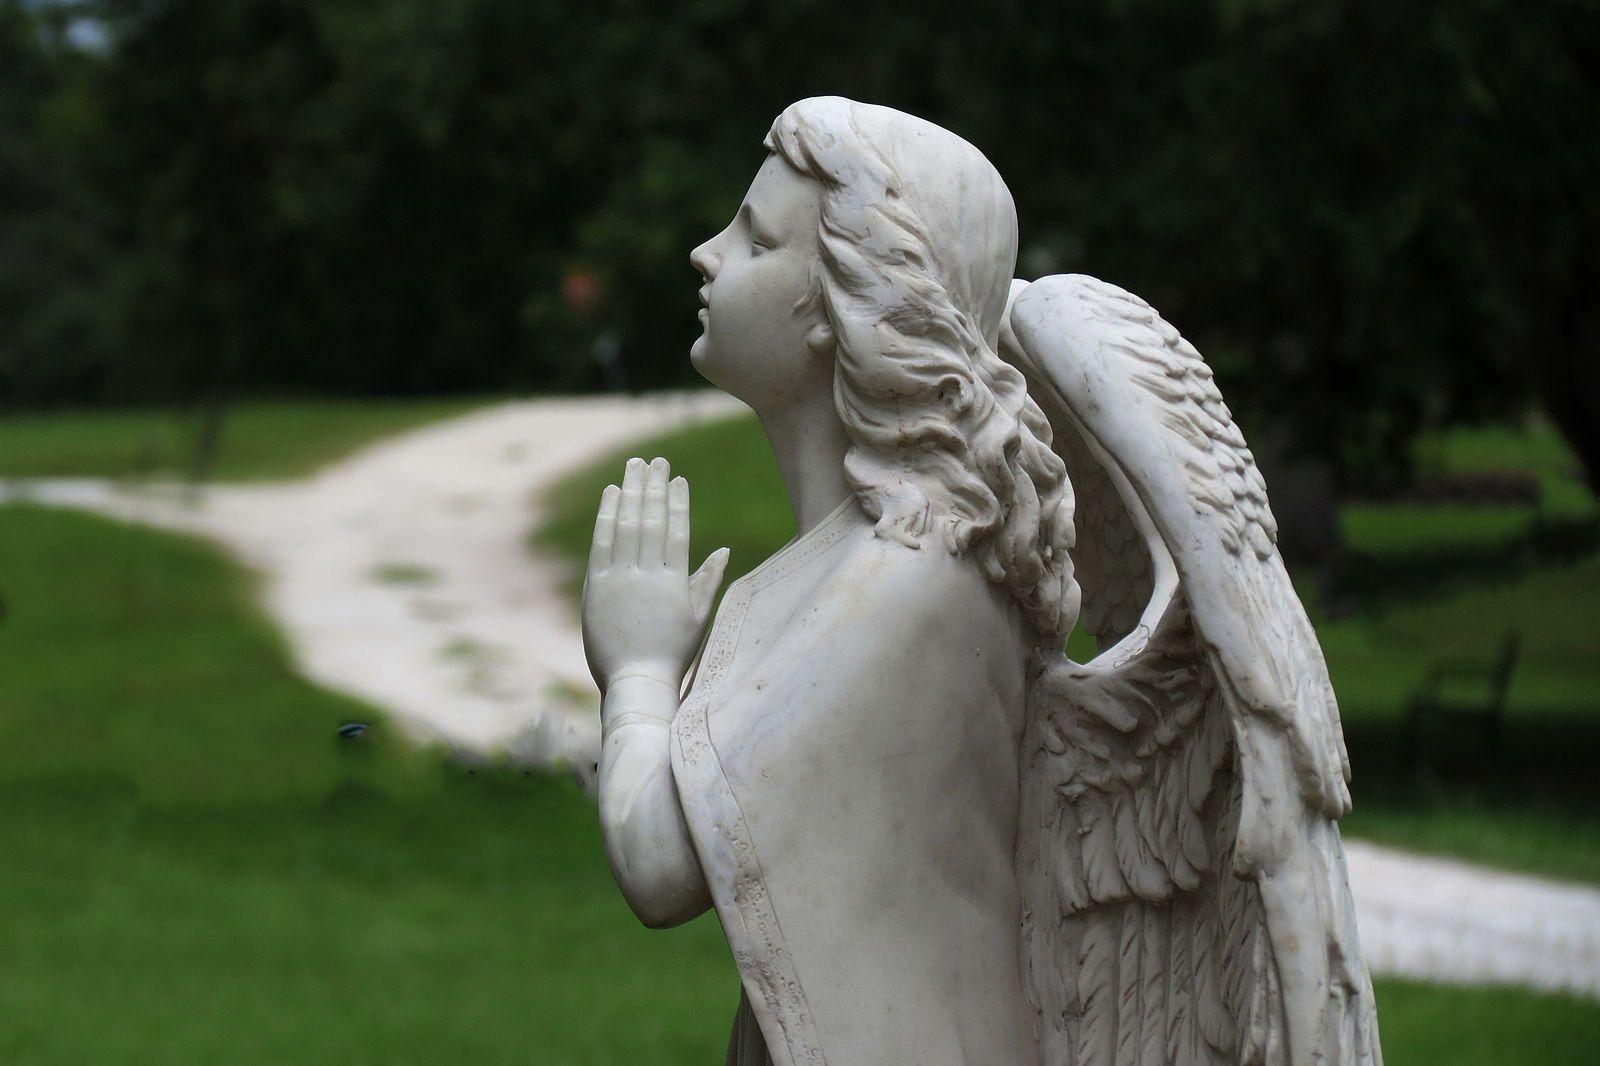 An Angelic Prayer of Gratitude